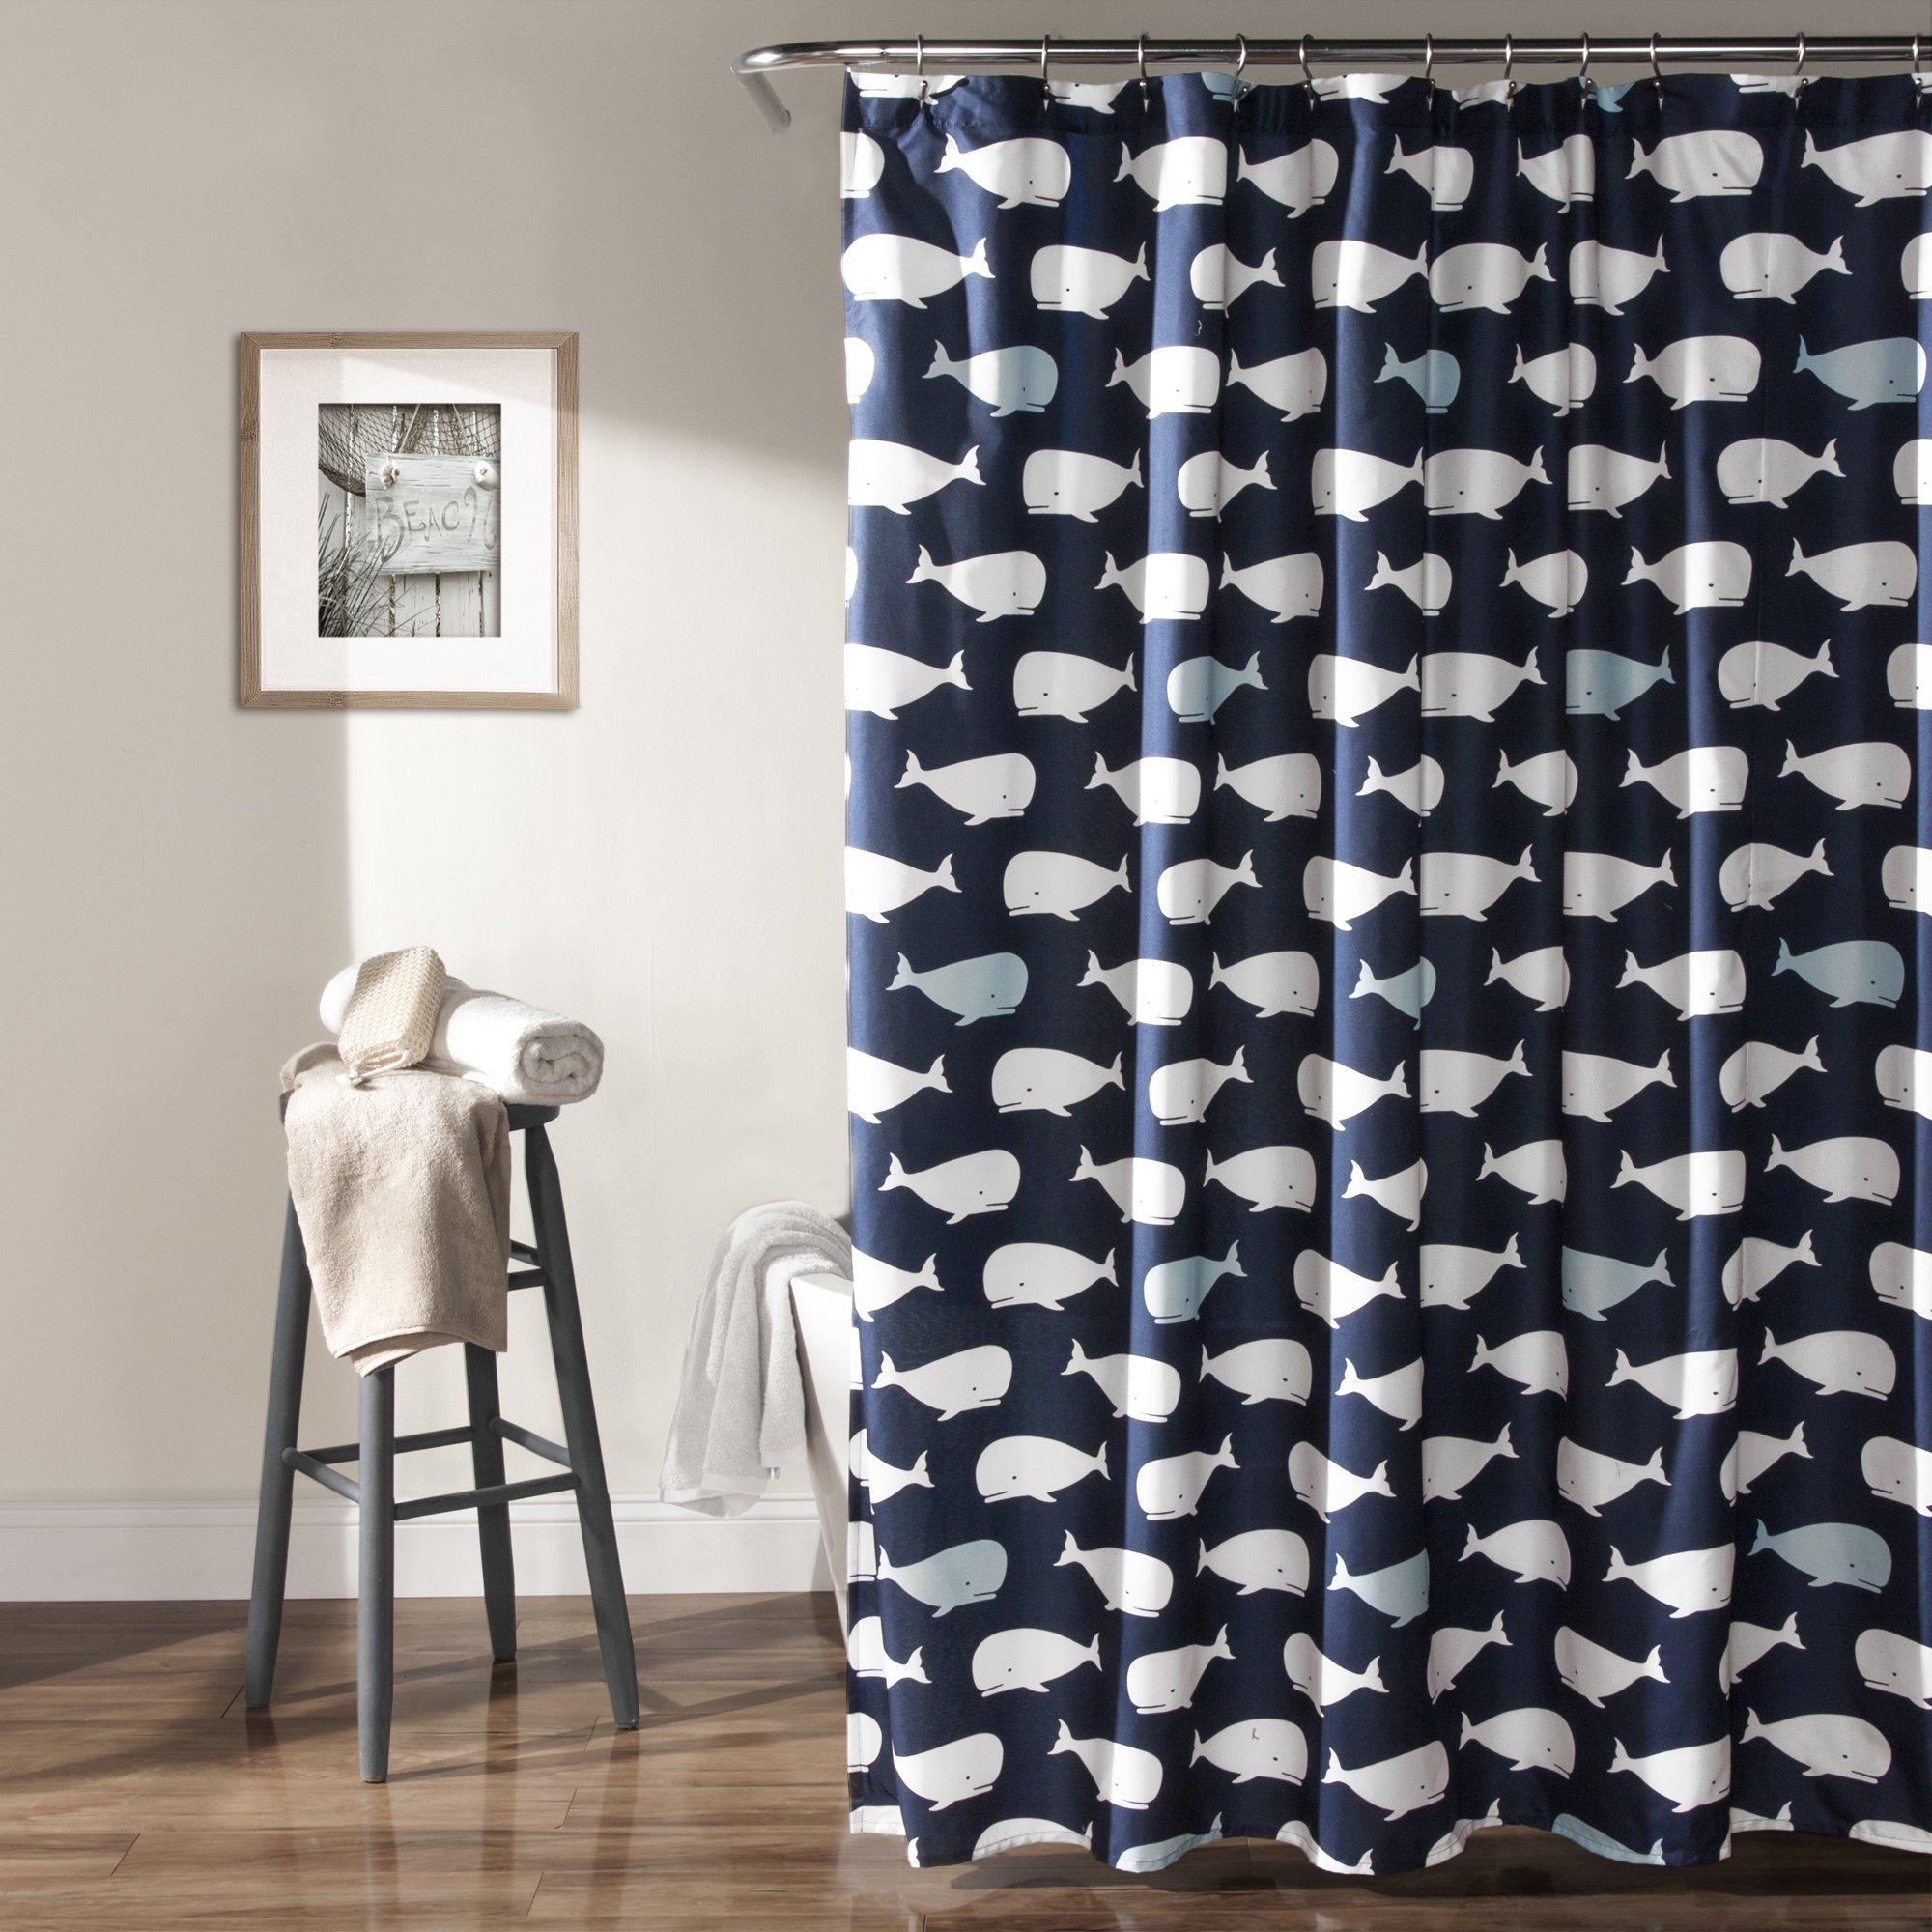 Lush Decor Whale Shower Curtain, 72 x 72, Navy